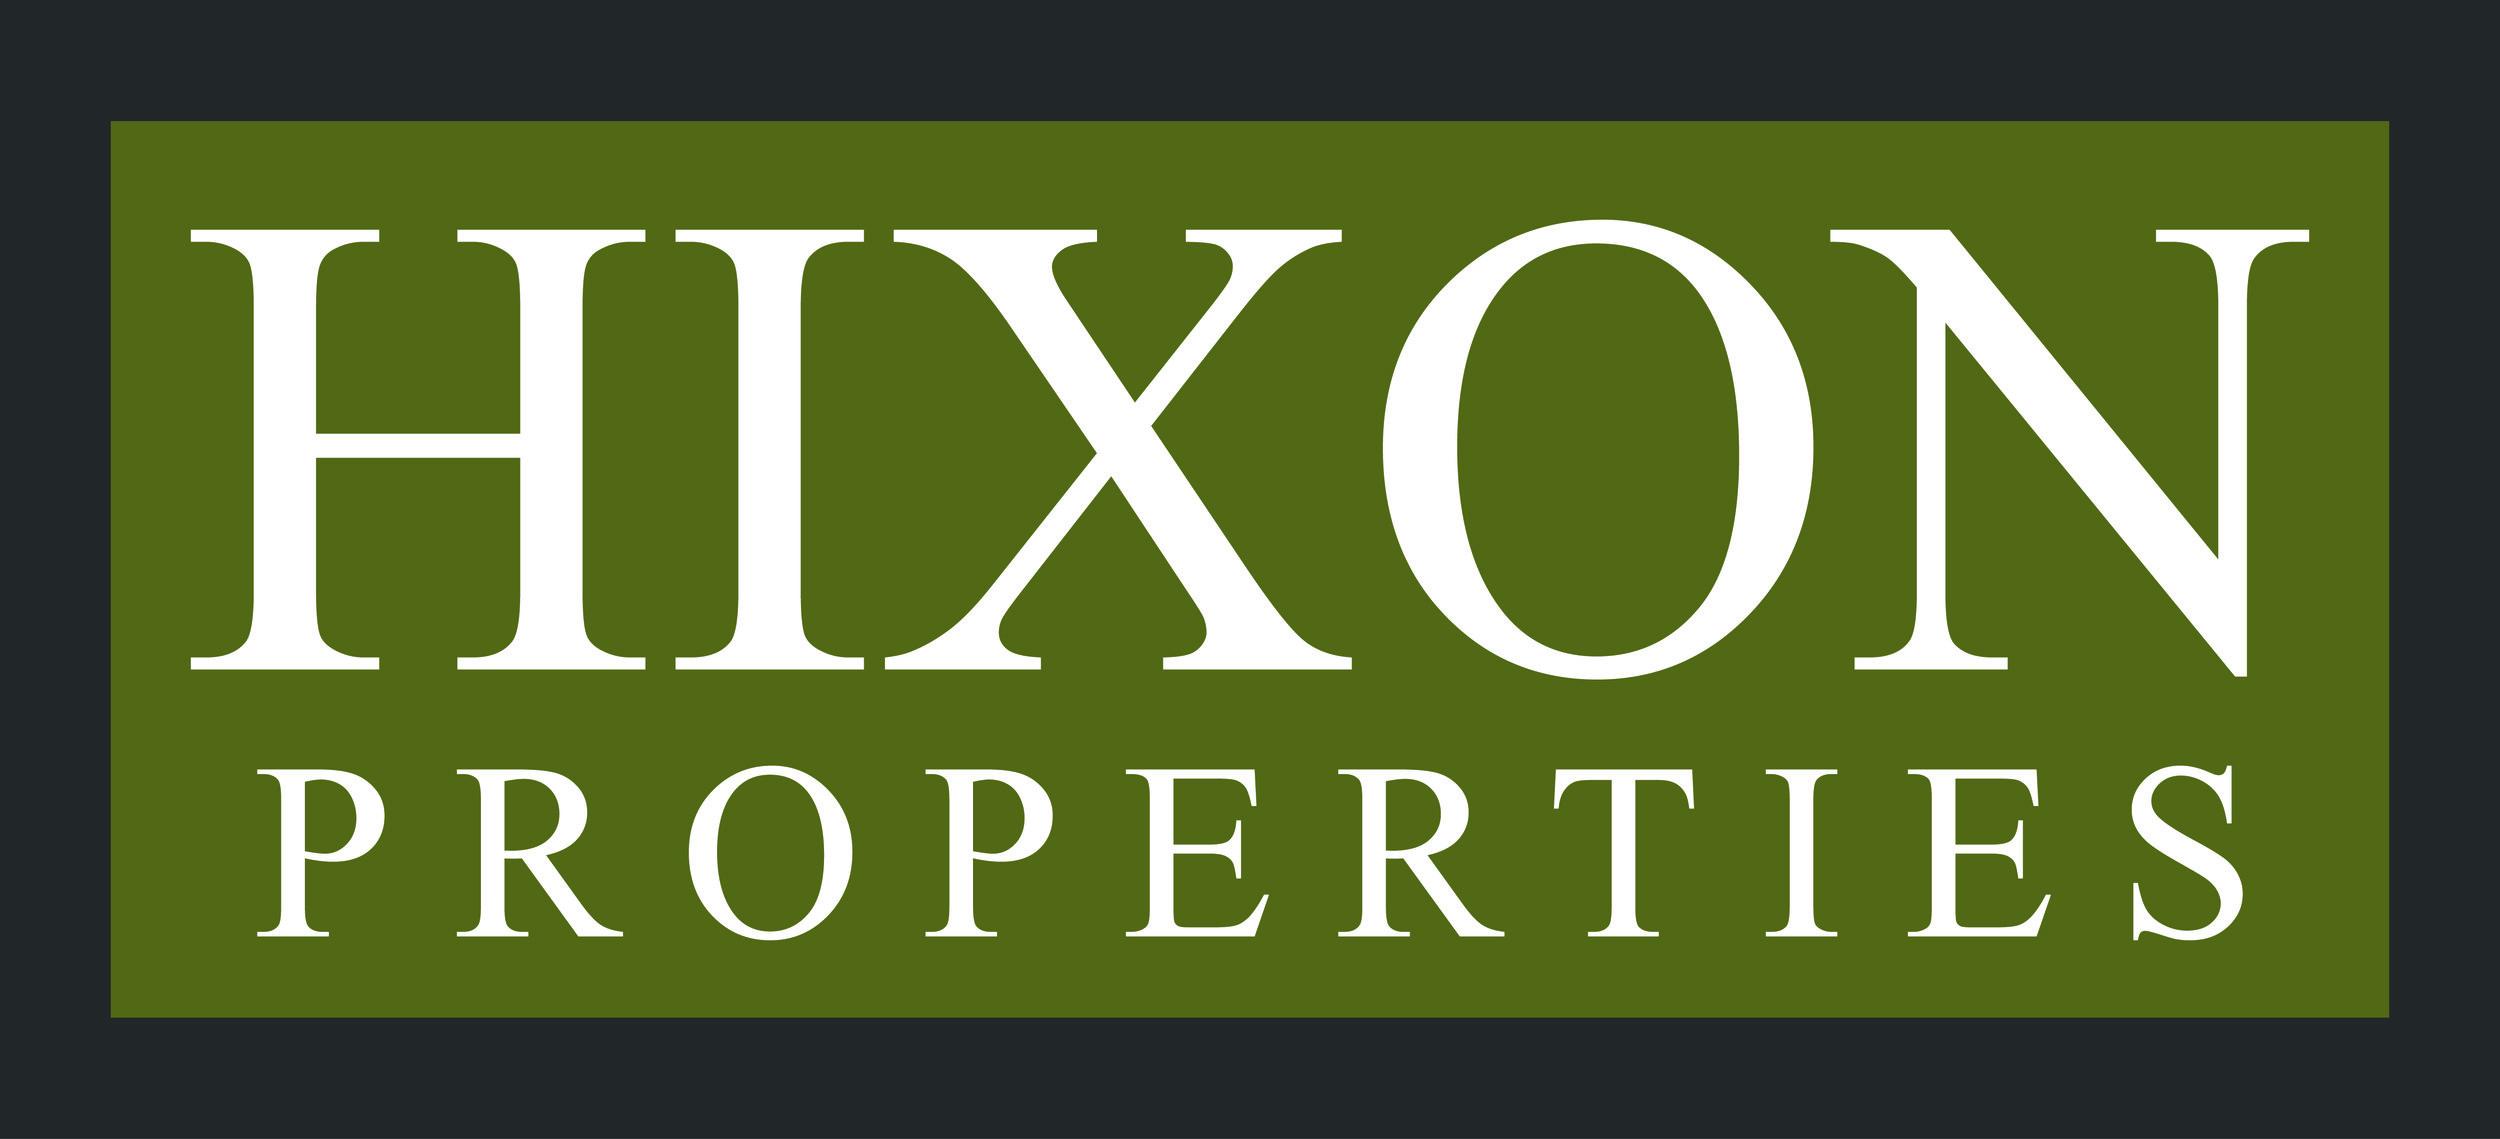 Hixon logo.jpg